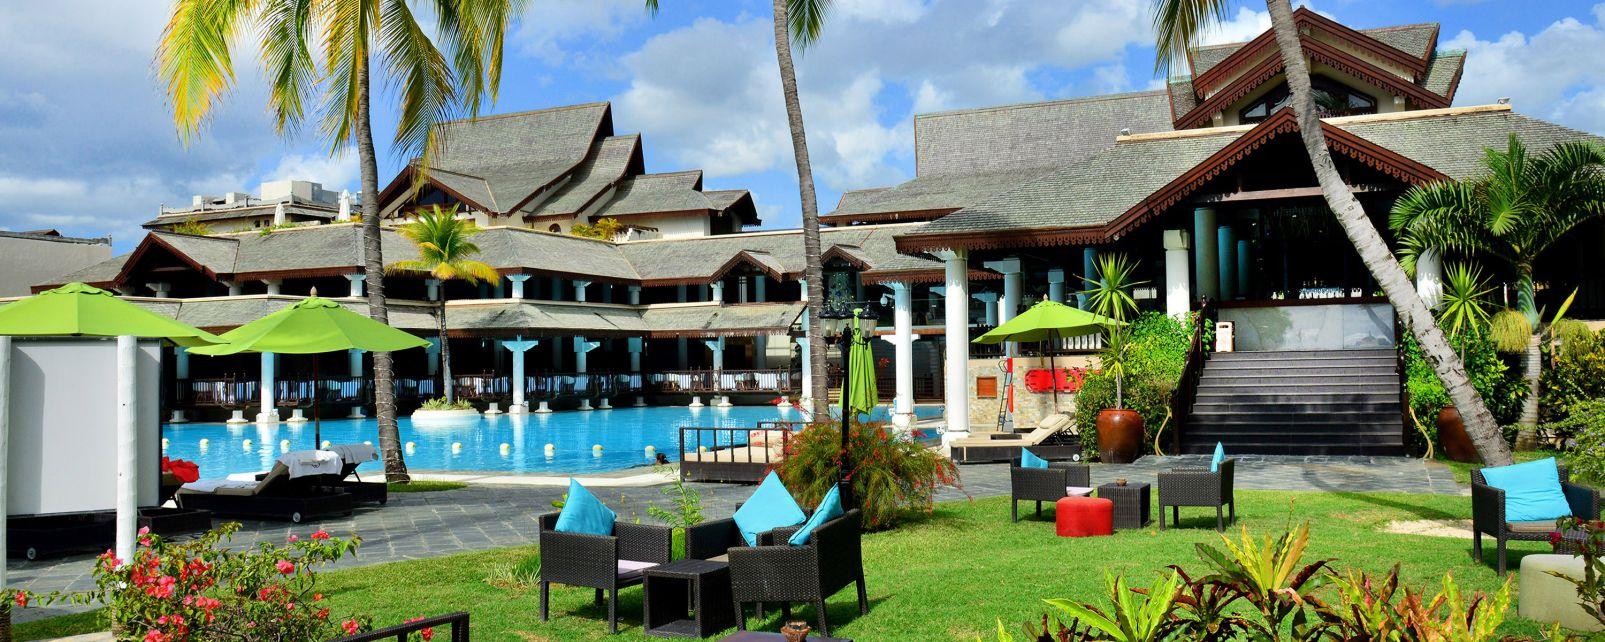 Hotel La Pirogue Ile Maurice Jet Tours